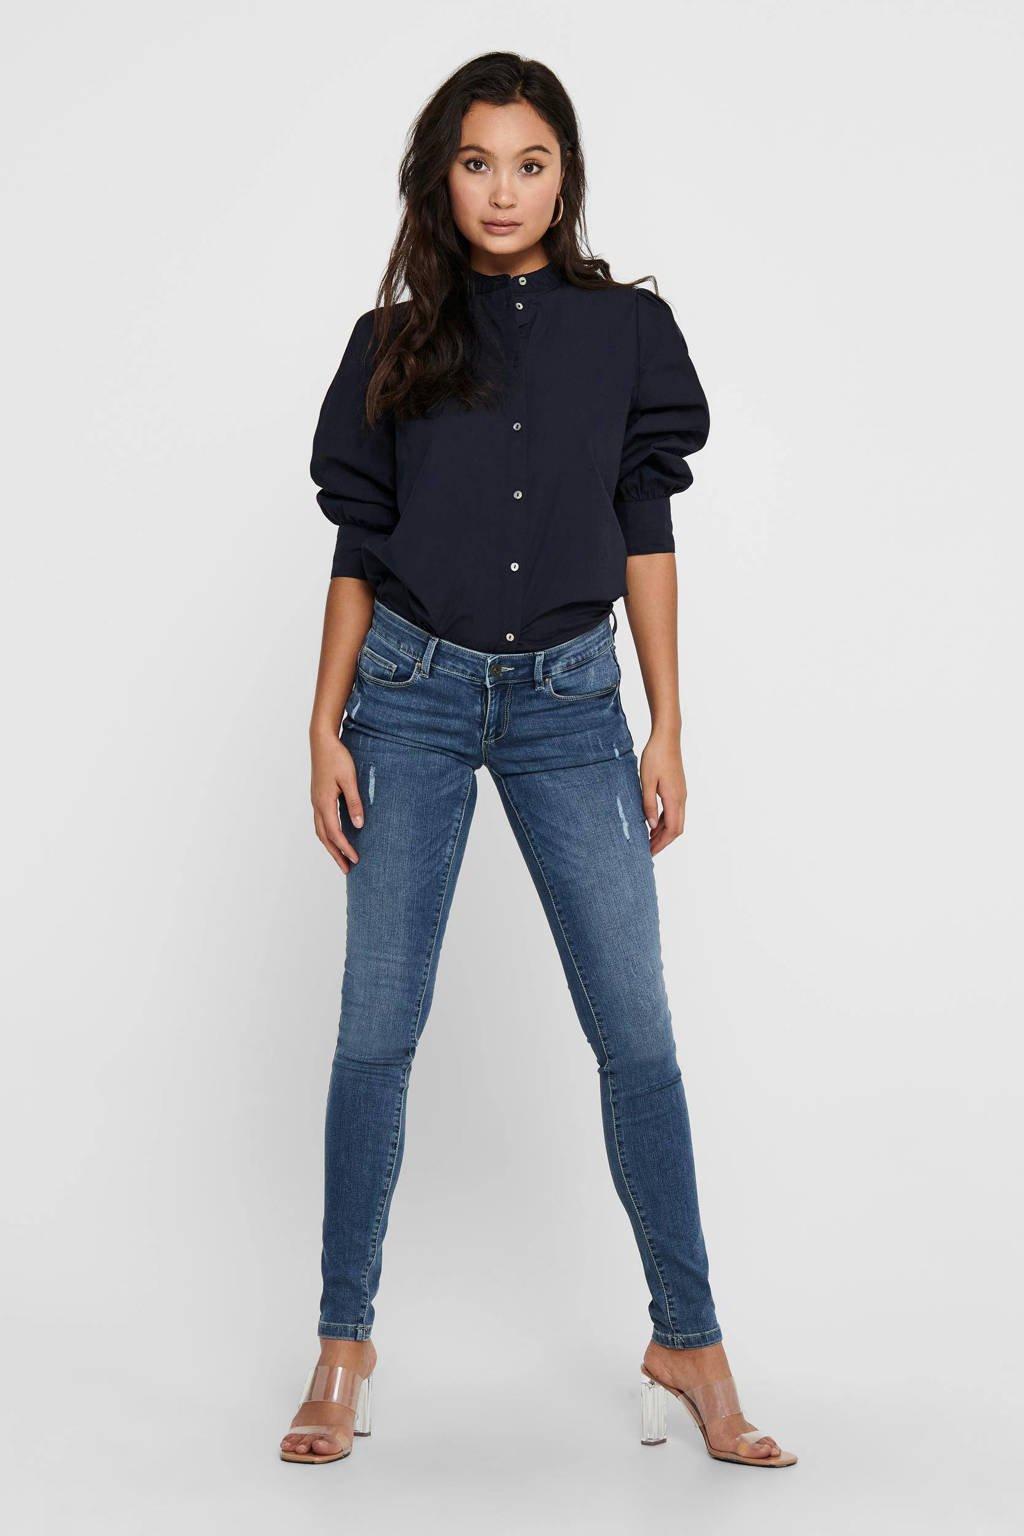 ONLY extra low waist skinny jeans ONLCORAL medium blue denim, Medium blue denim